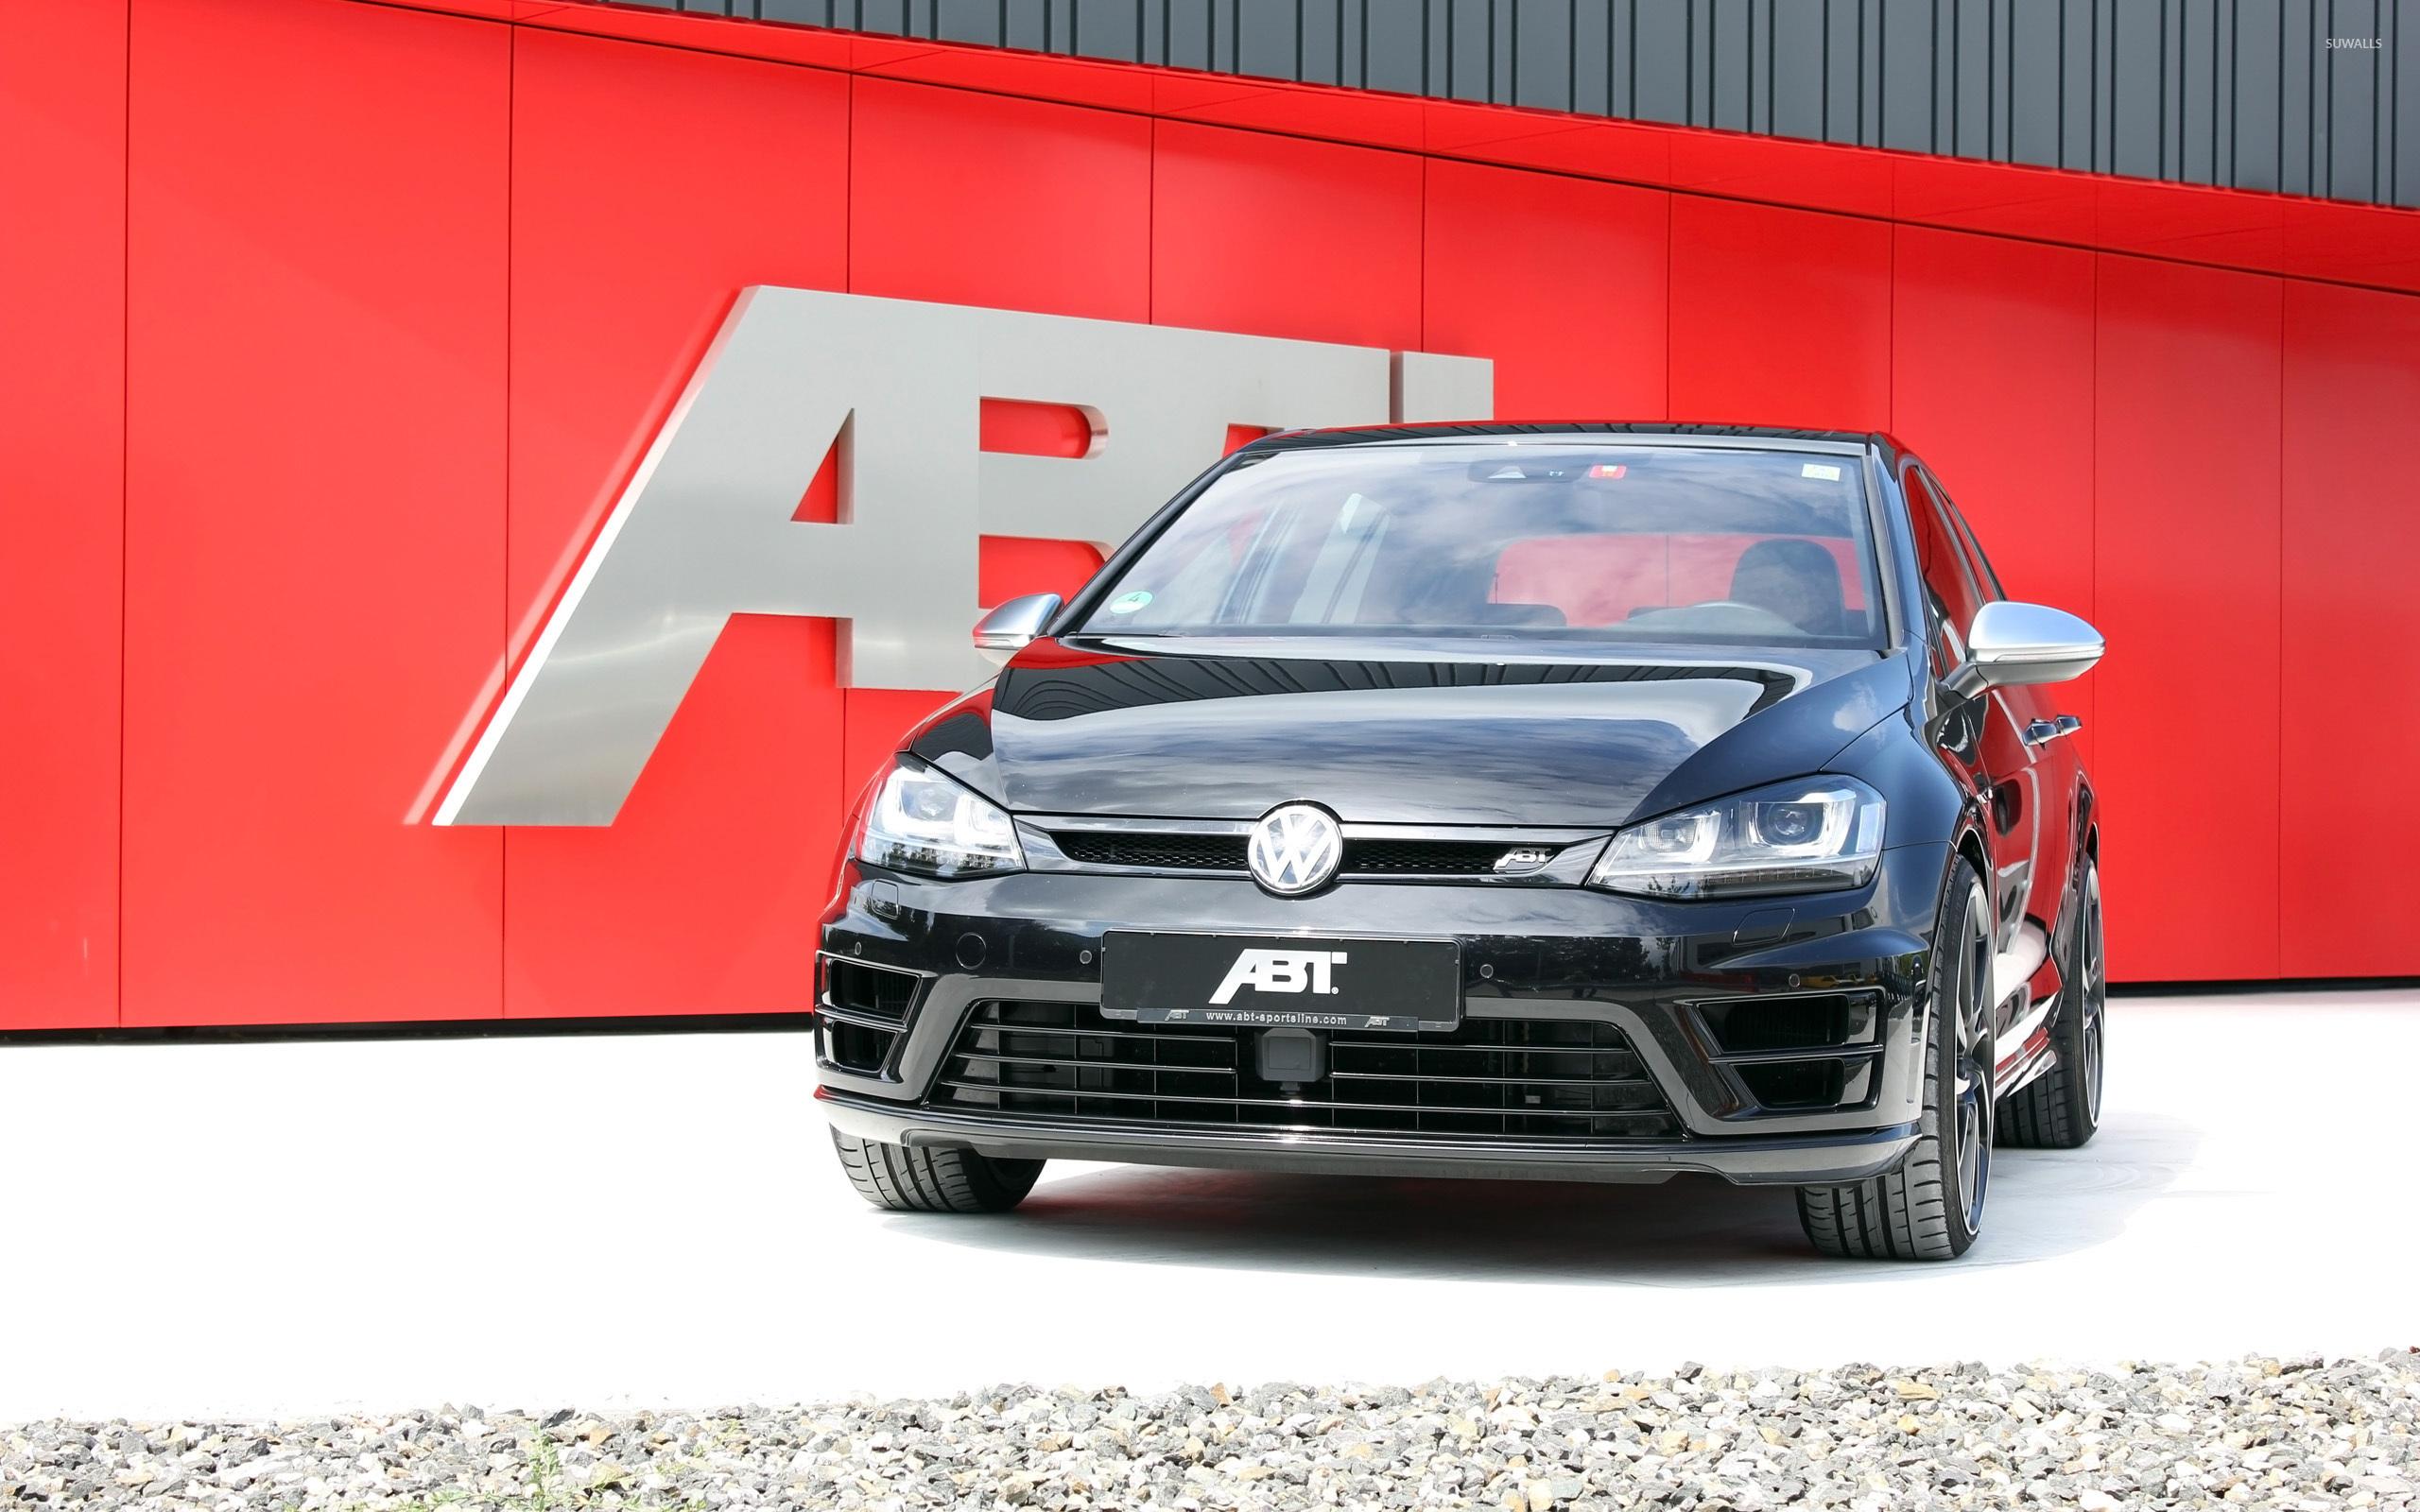 Black 2014 ABT Volkswagen Golf Mk7 Front View Wallpaper